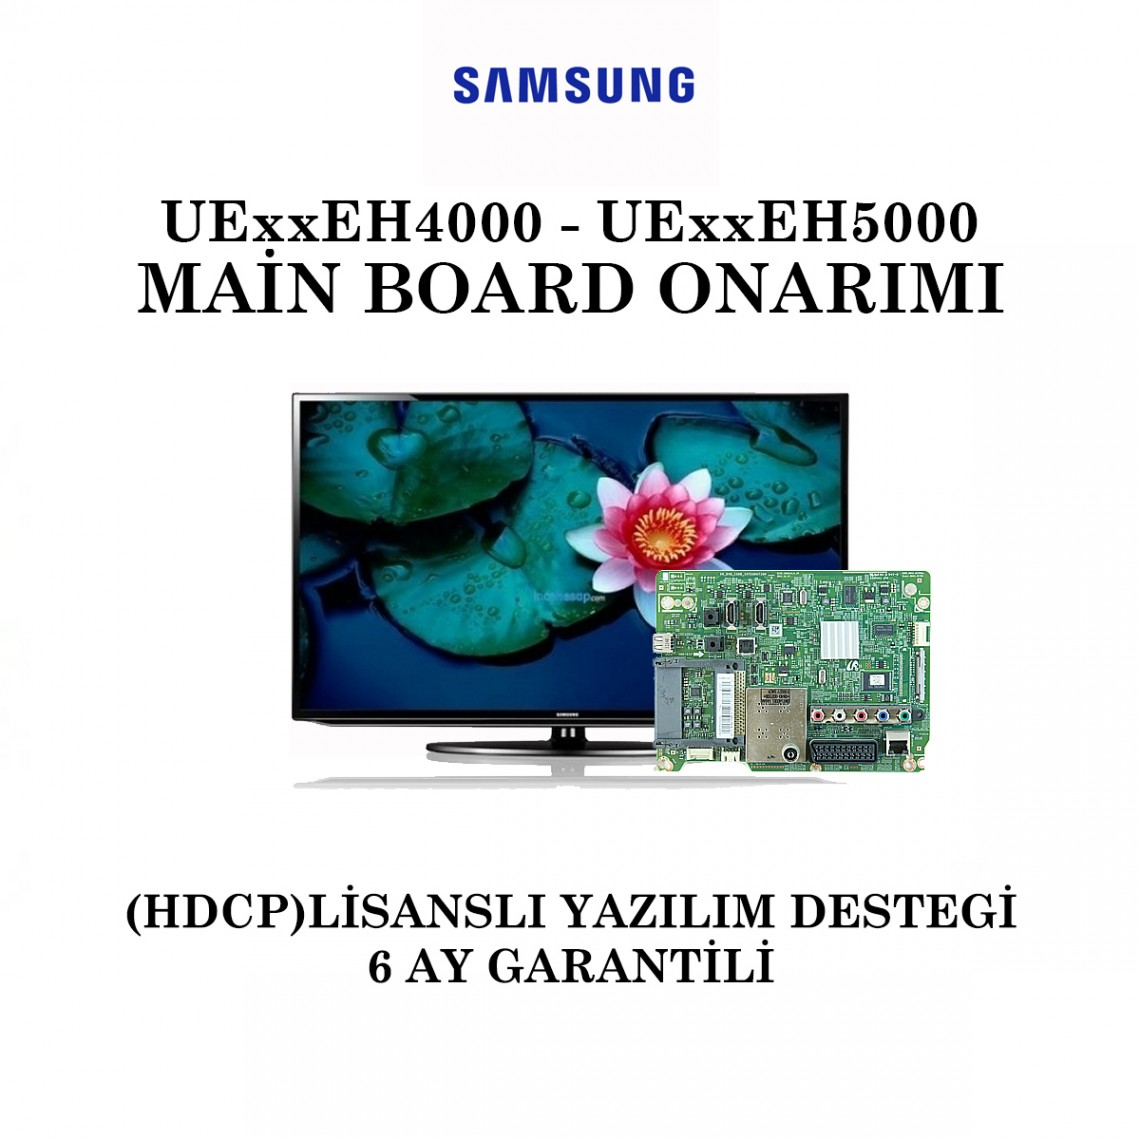 SAMSUNG, BN41-01795A, UE32EH4000, UE32EH5000, UE40EH5000, UE46EH5000, Main Board Onarımı